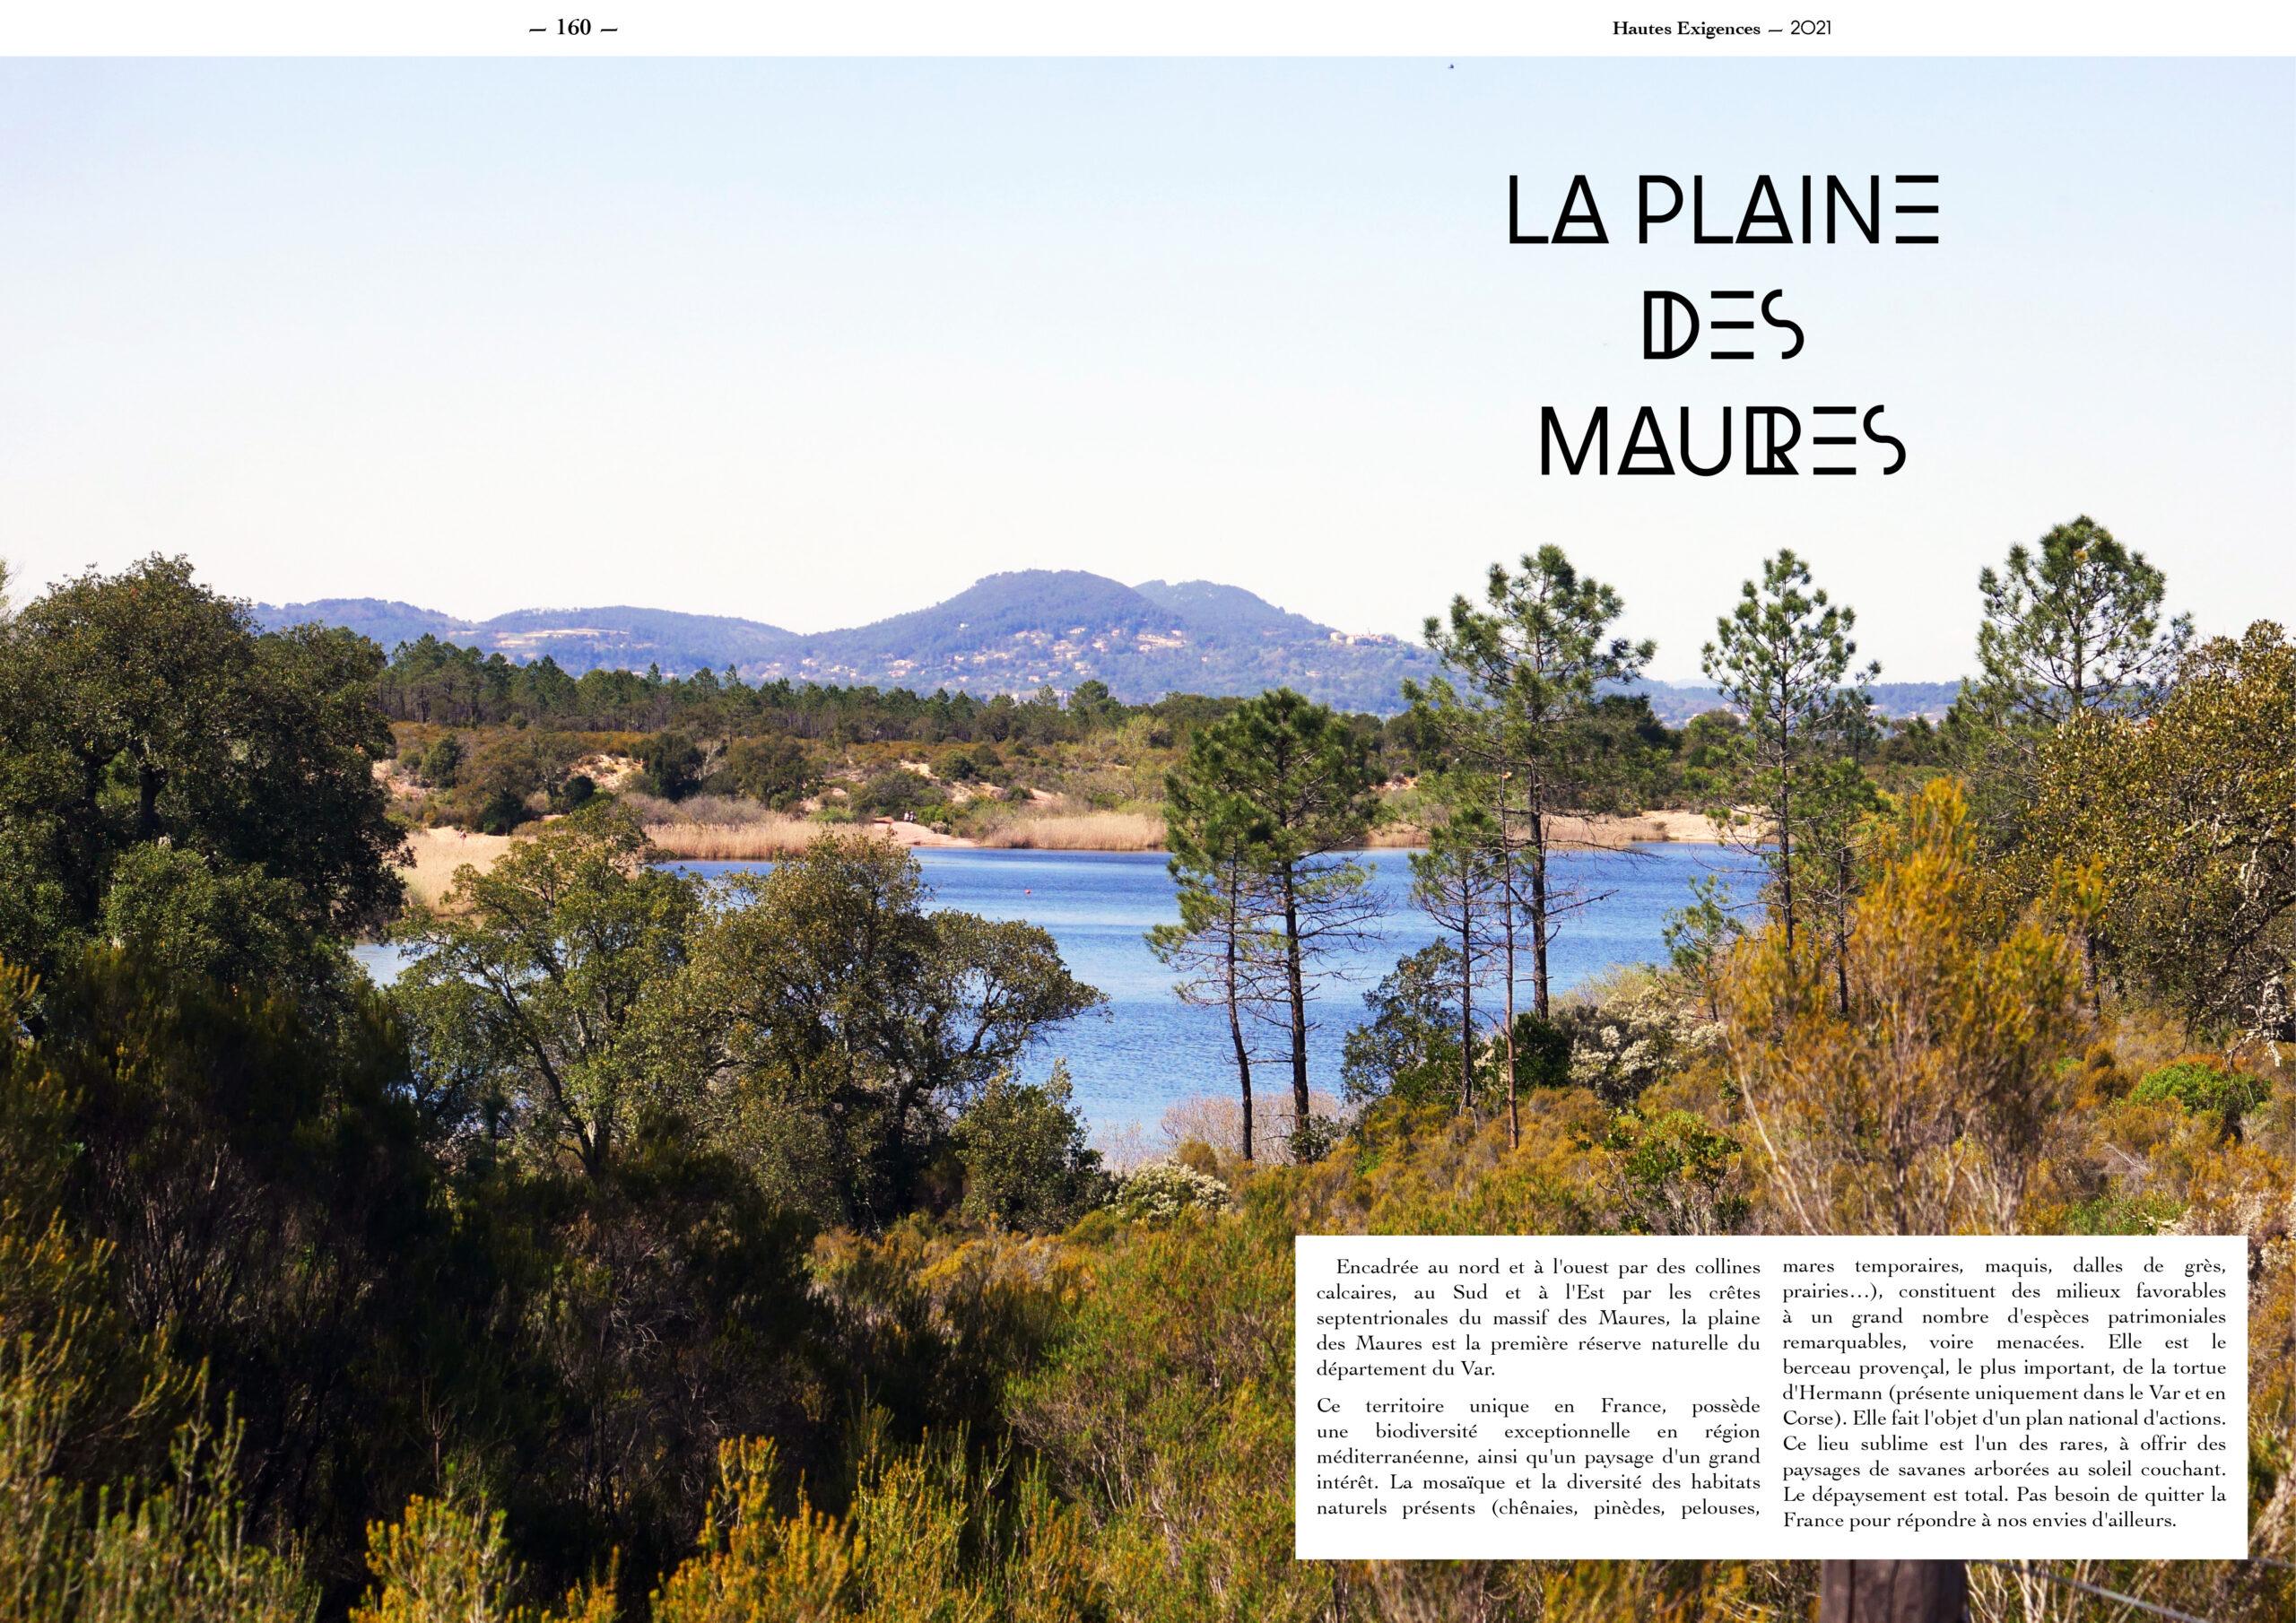 Hautes Exigences Magazine Hors Serie 2021 page 158-159